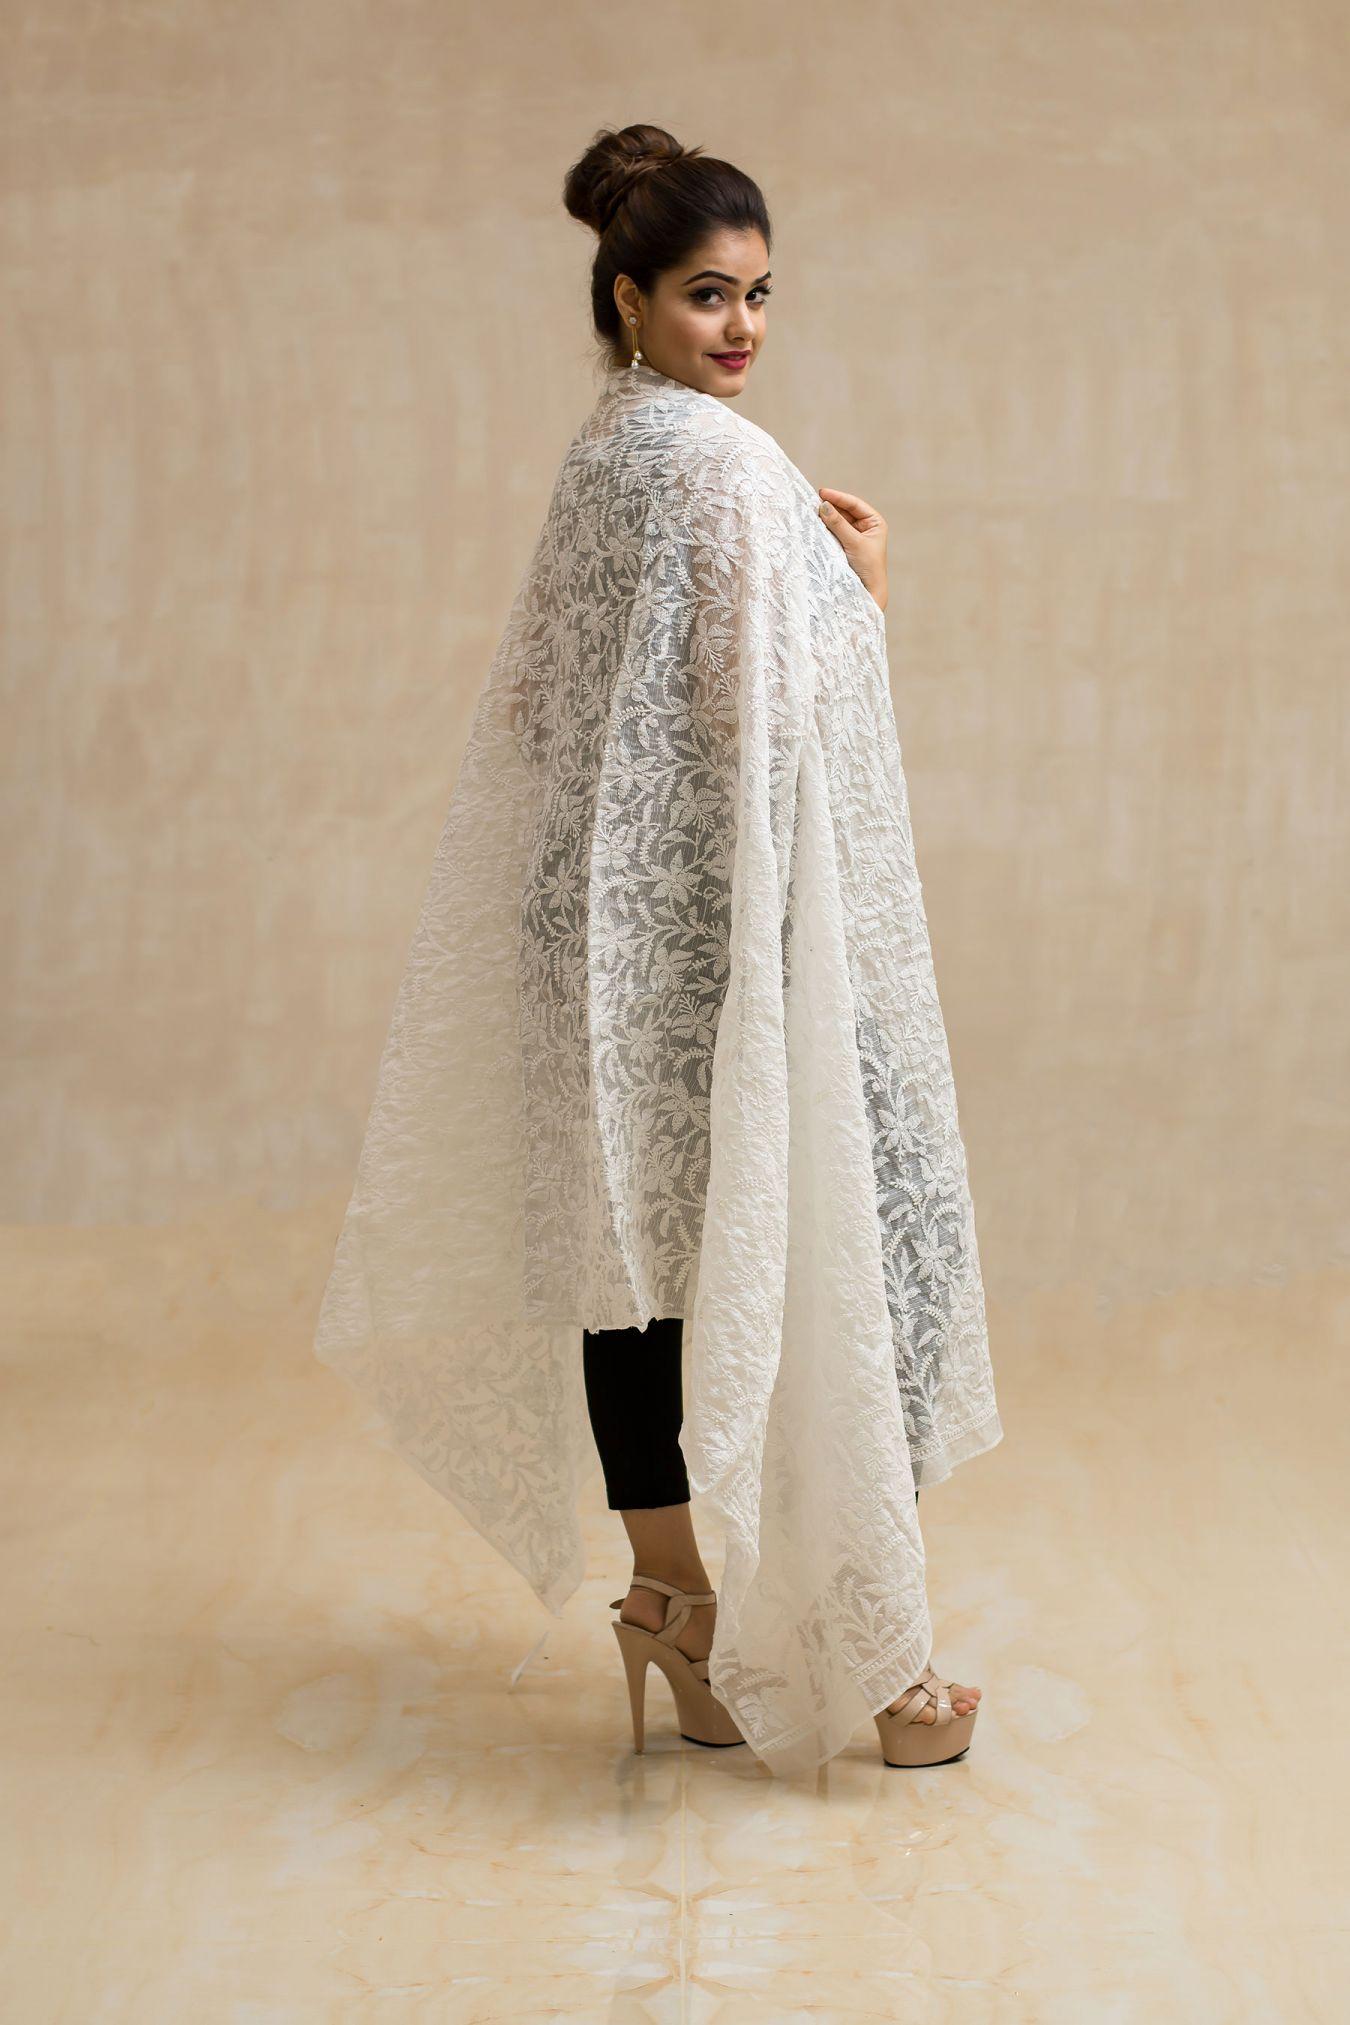 Radiant White Handcrafted Chikan Jaal Kota Doria Dupatta